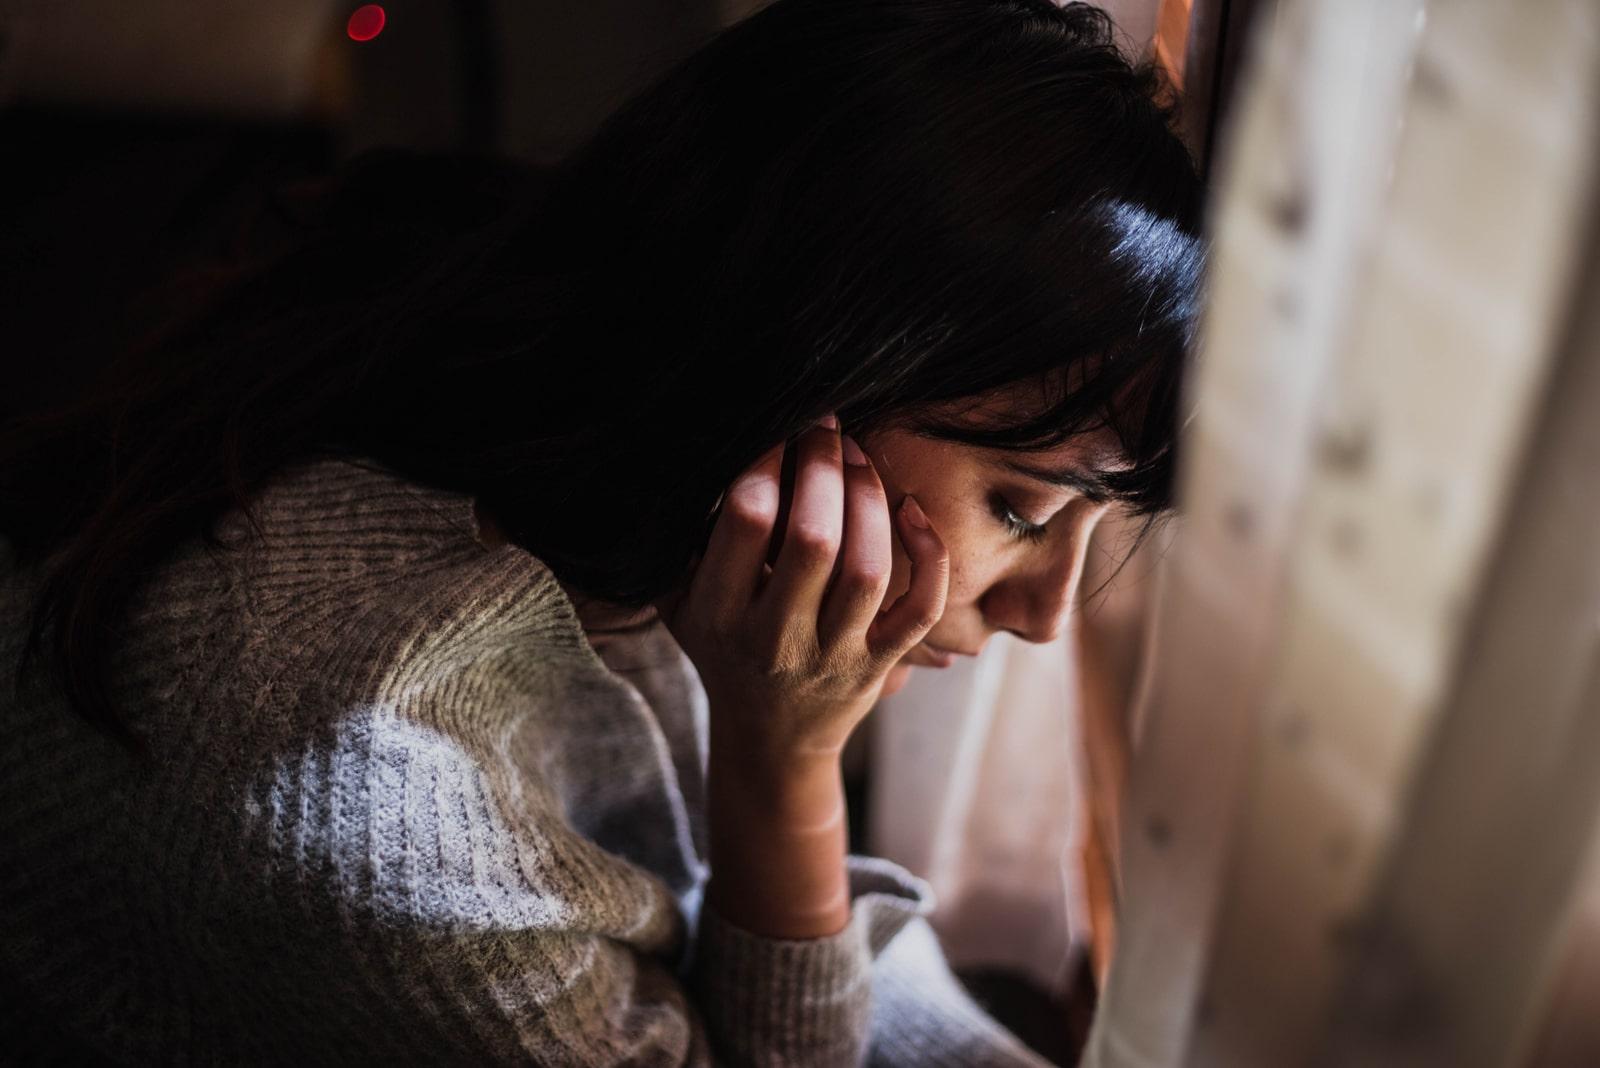 pensive sad woman sitting by the window